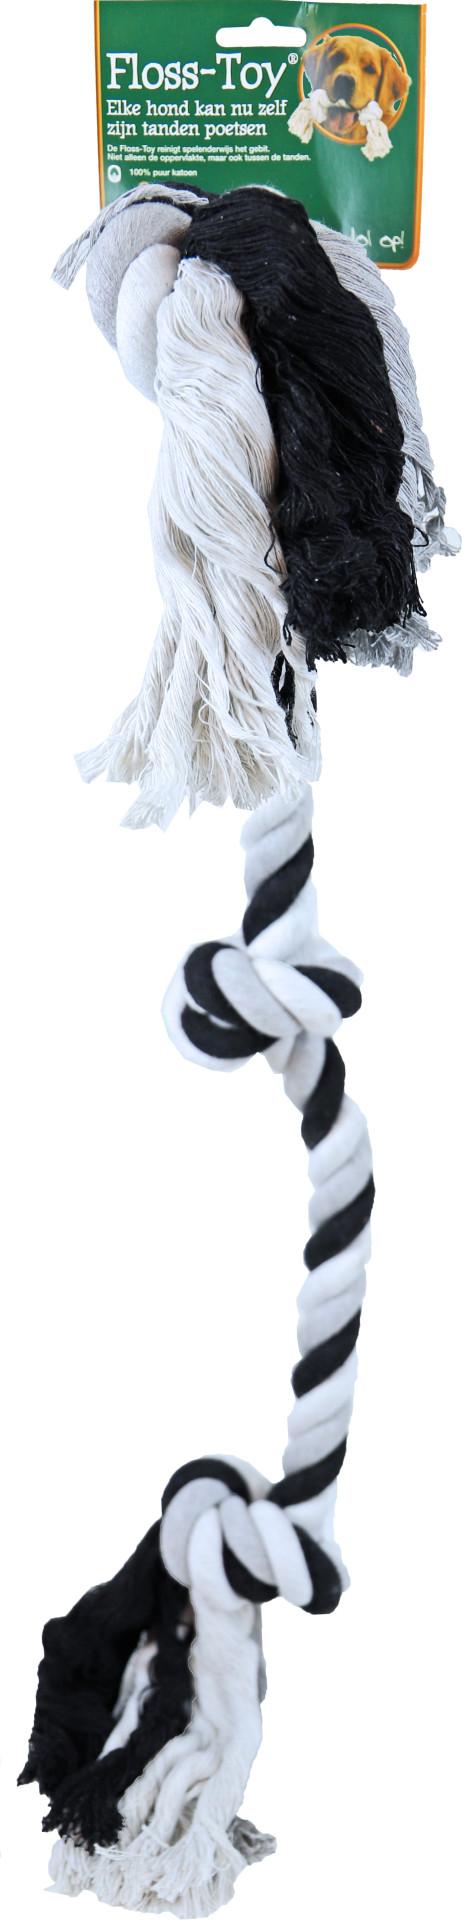 Boon Floss-Toy 3-knoop Giant zwart/wit